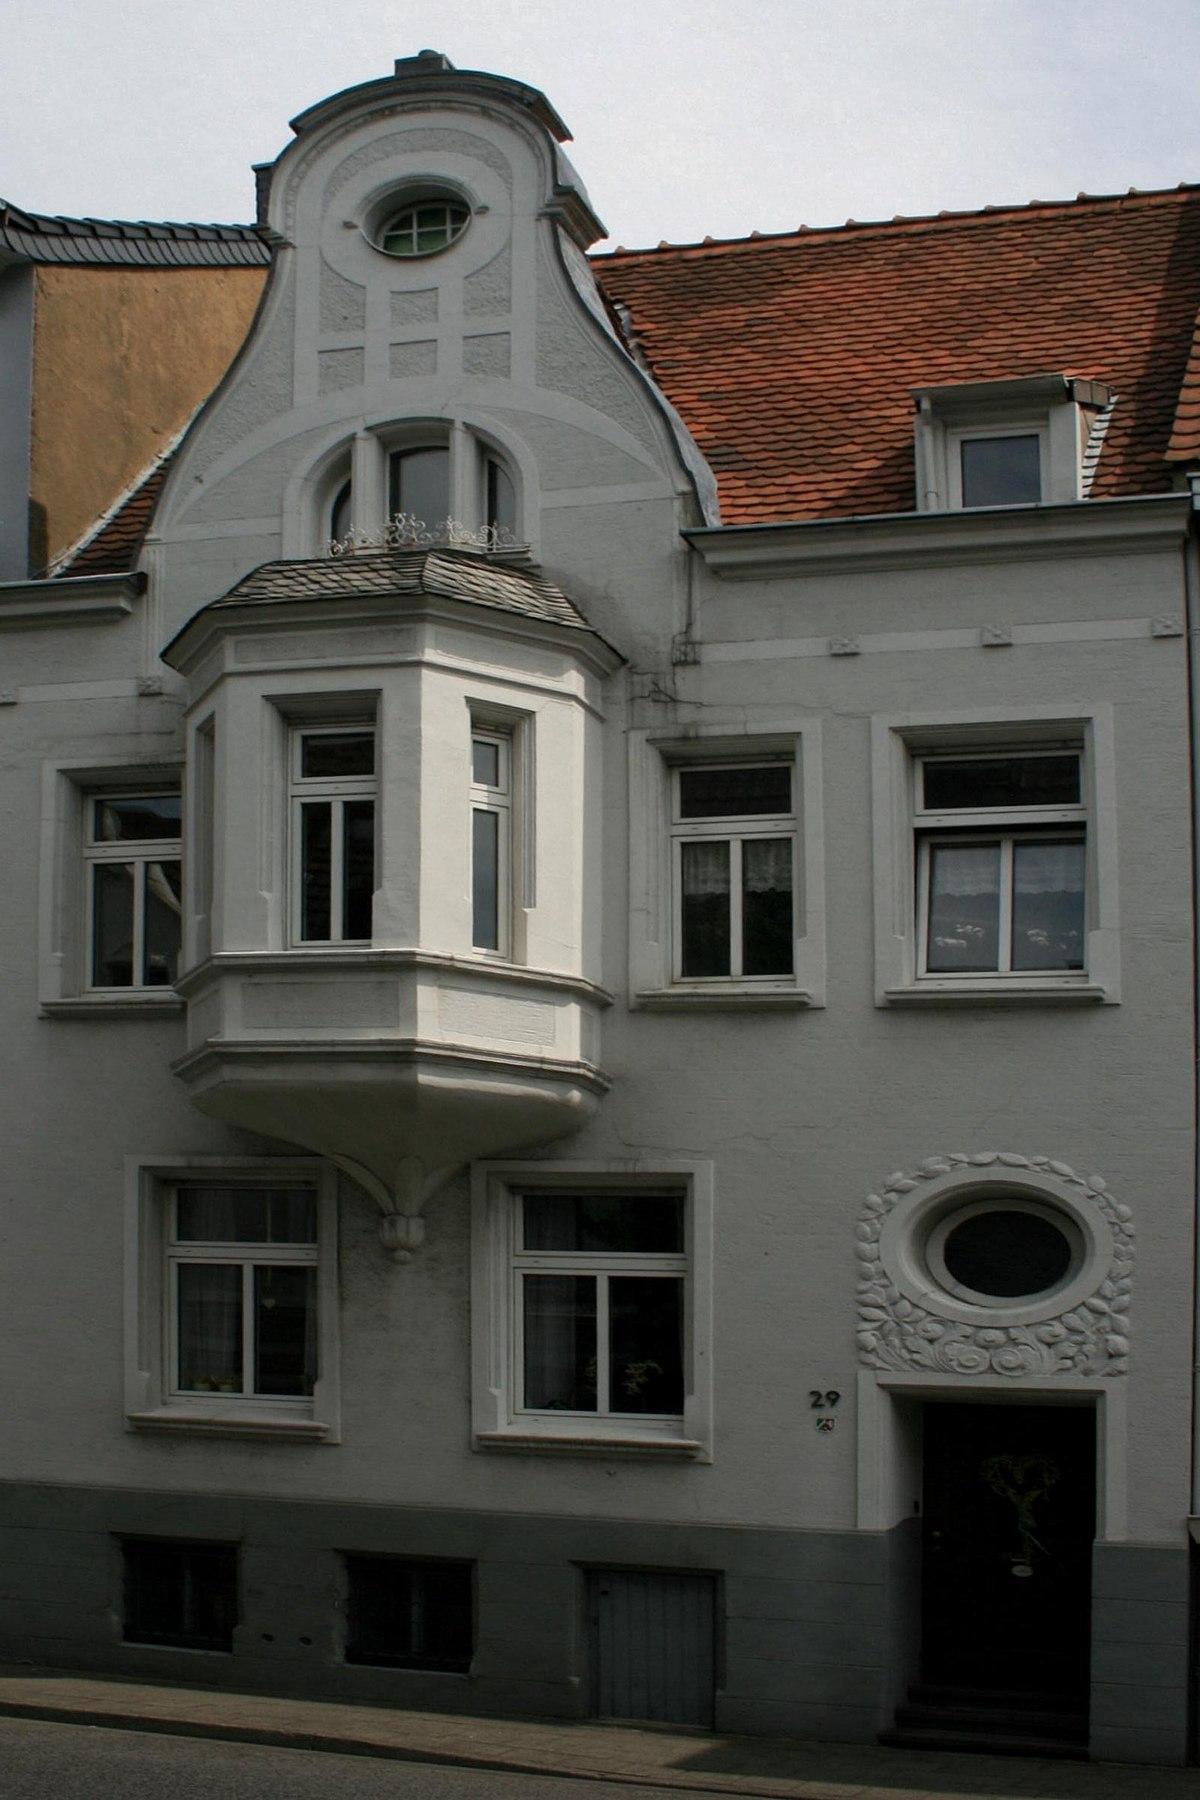 Fenster M Nchengladbach bylandtstraße 29 mönchengladbach